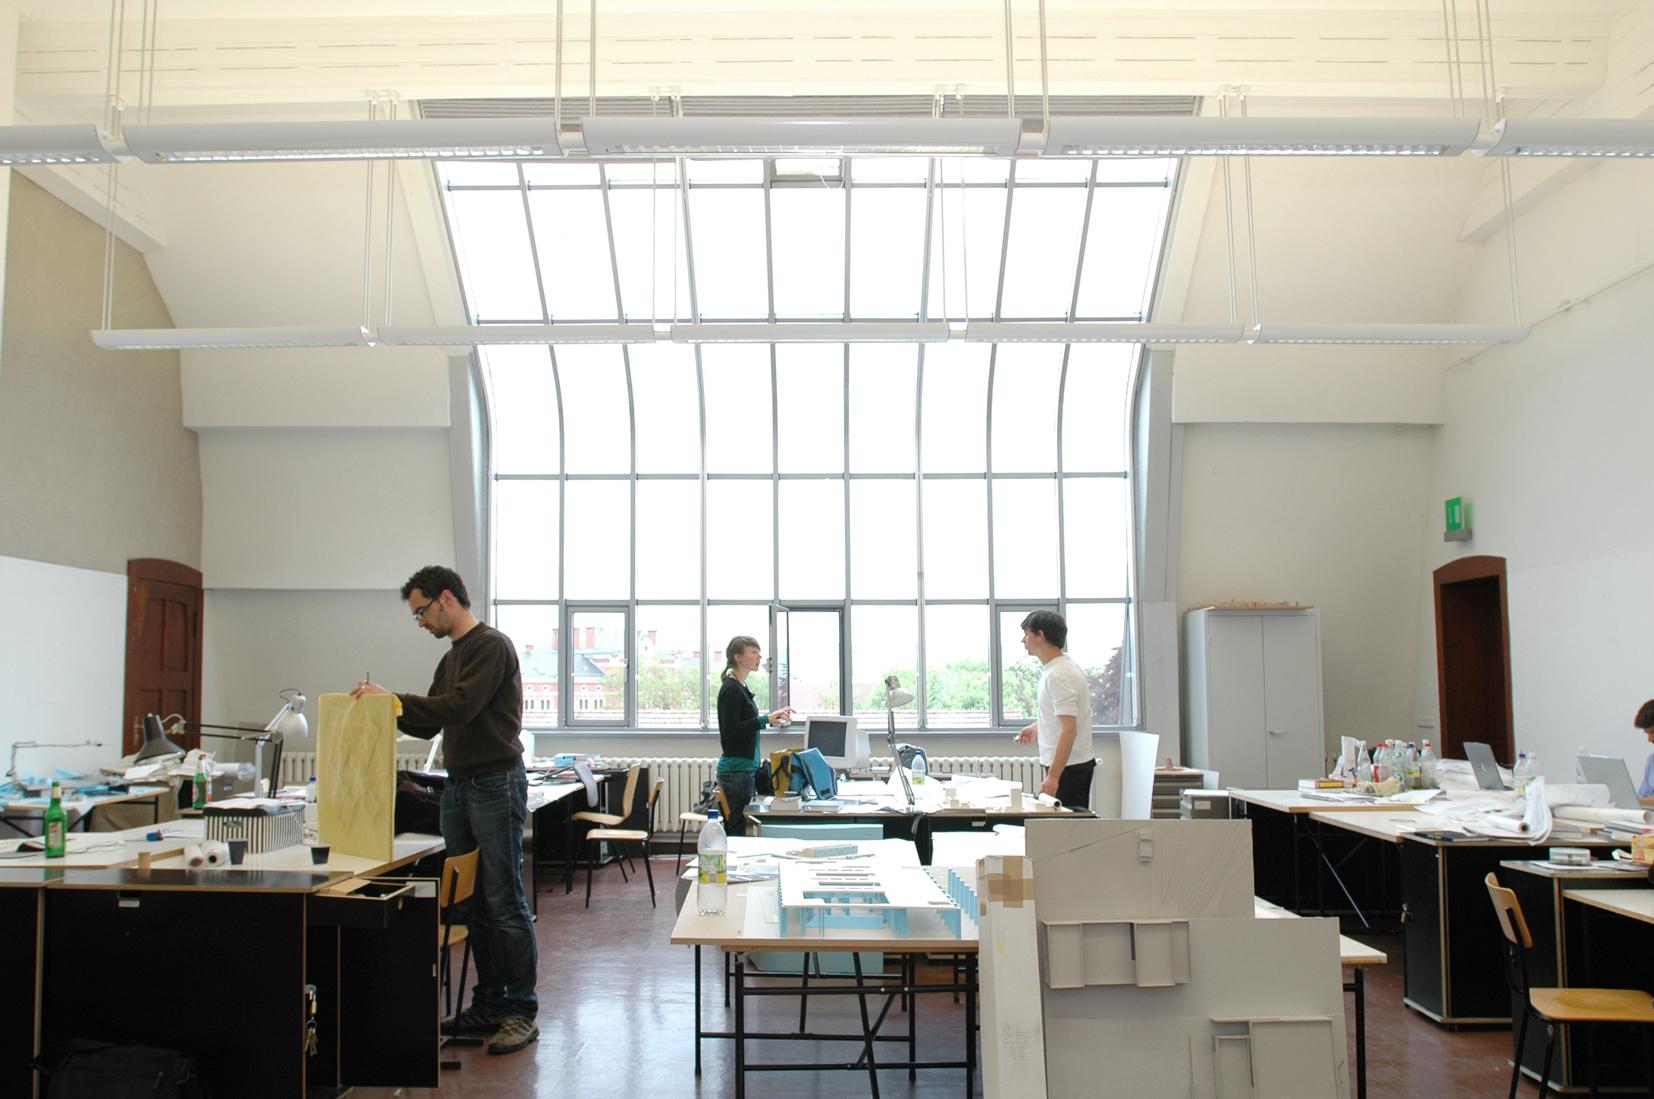 Bauhaus University Weimar Atelier Space